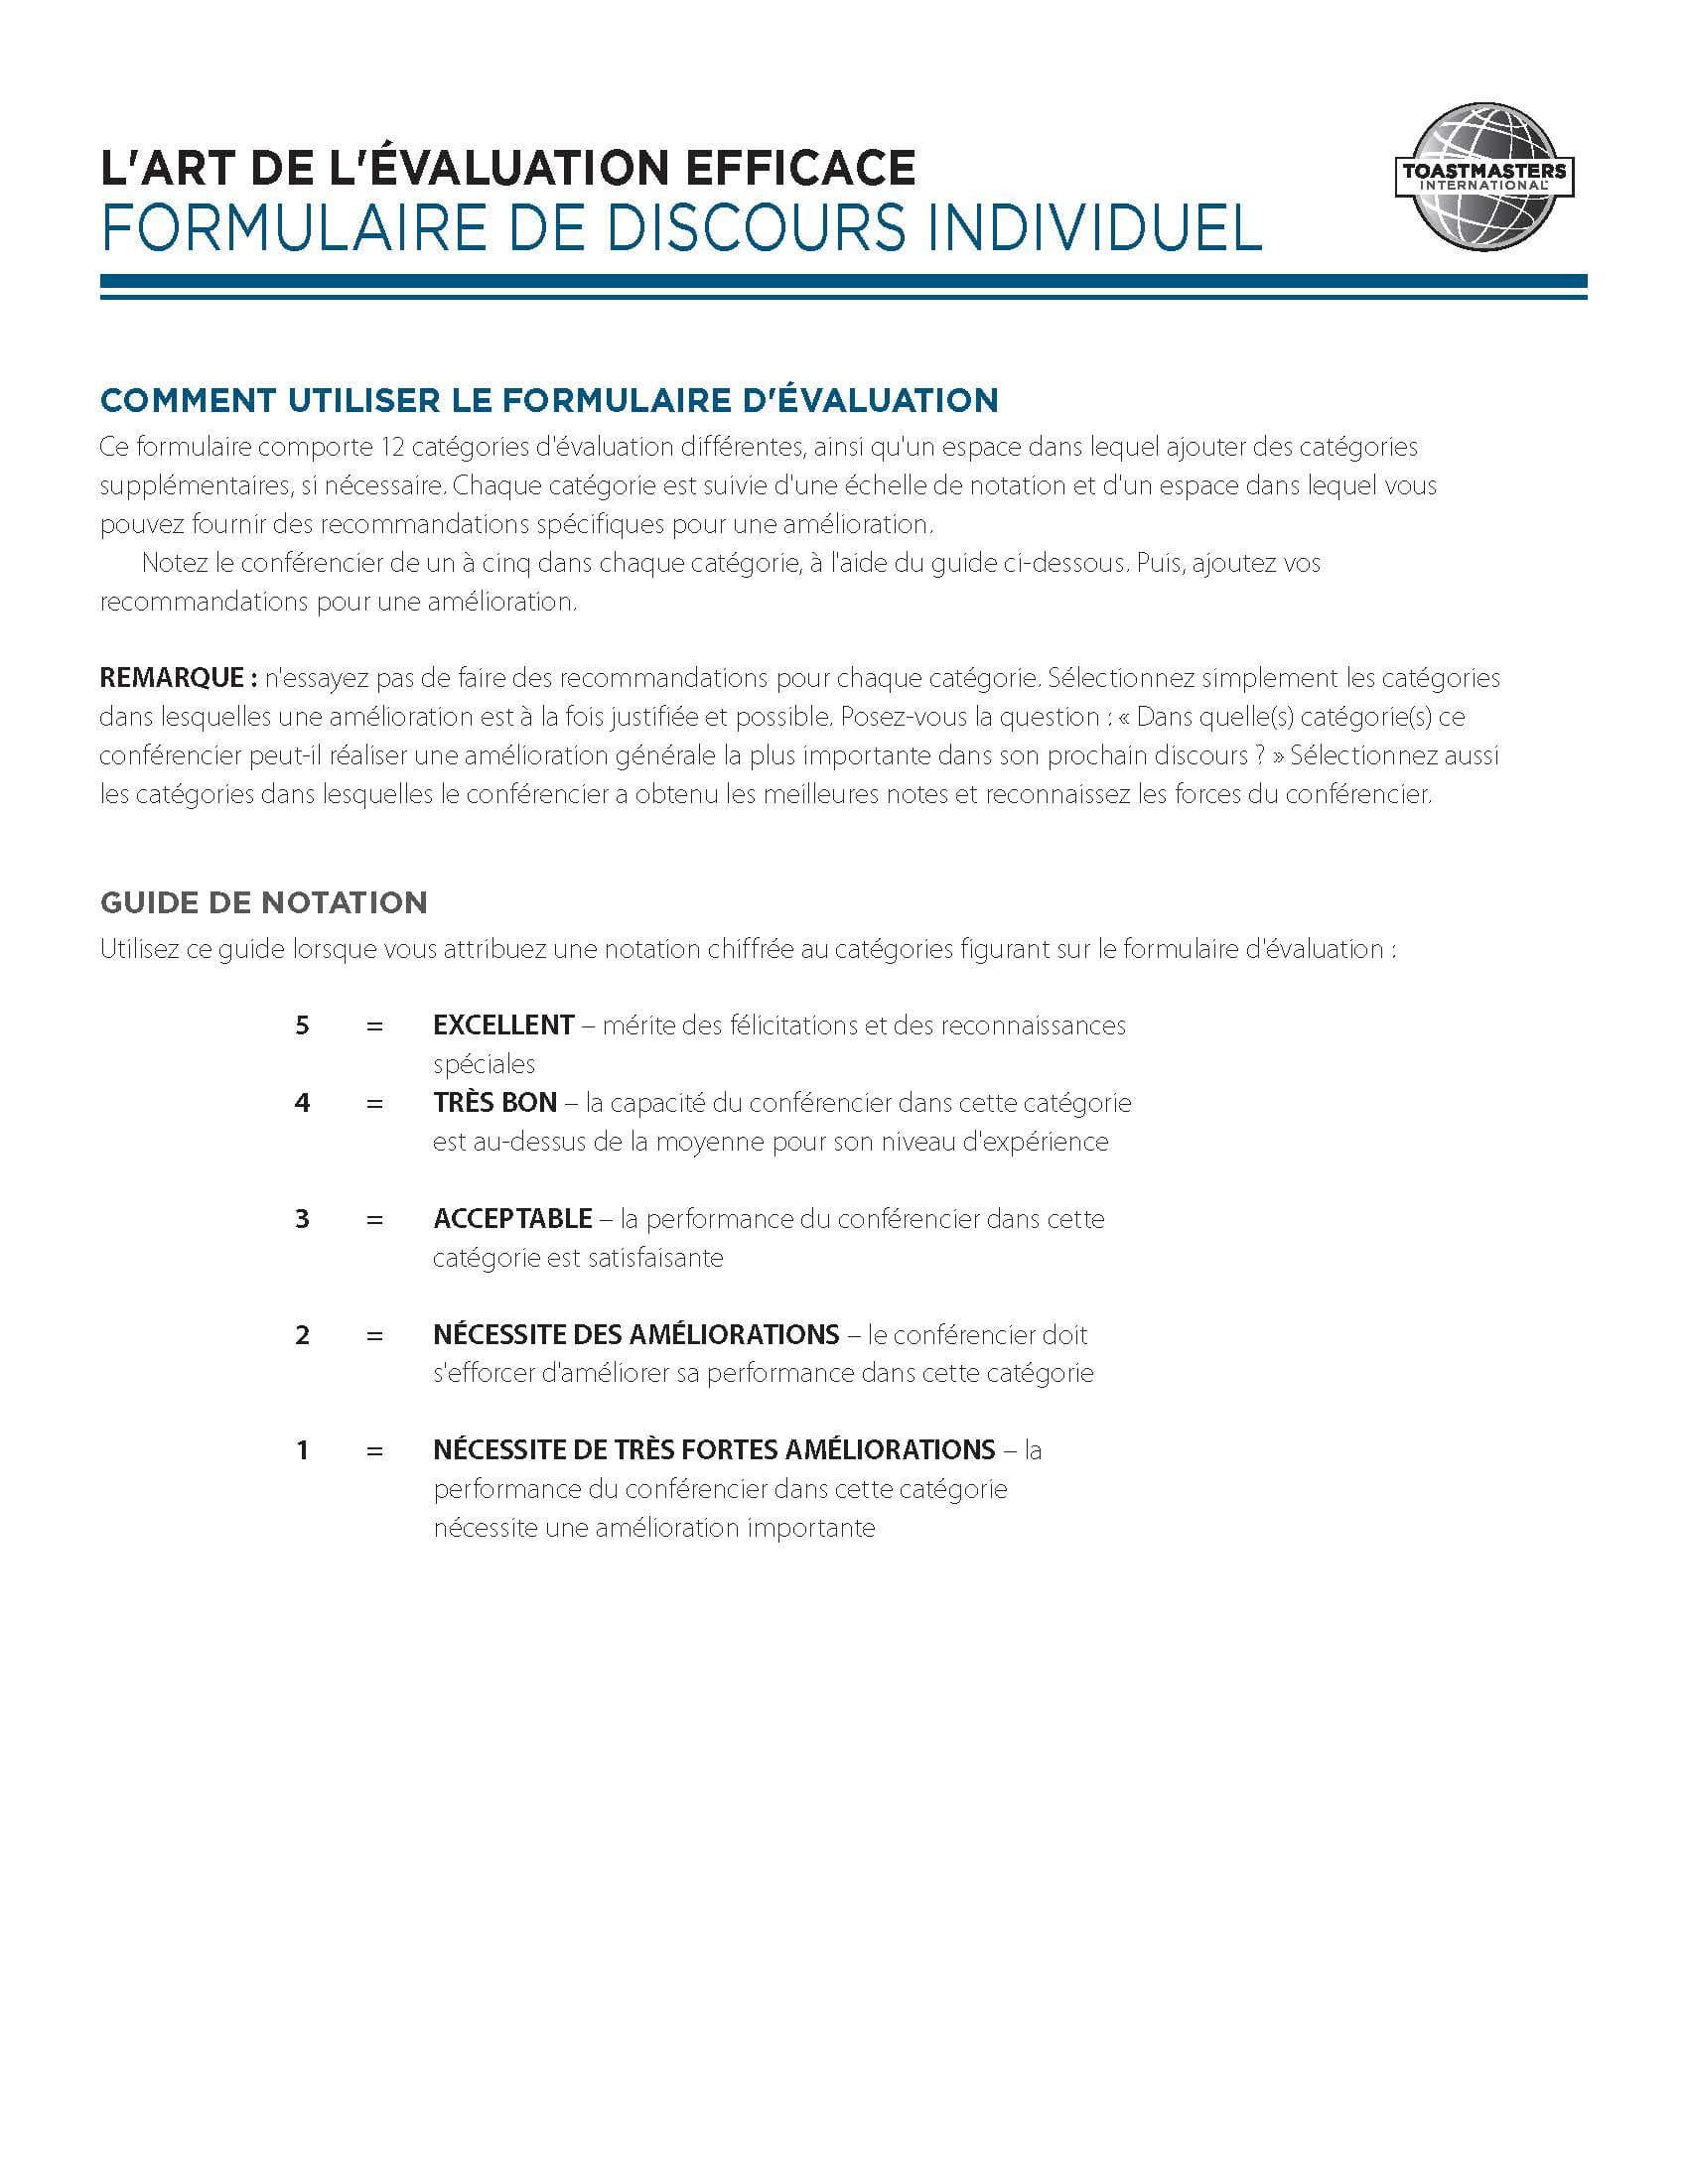 toastmasters evaluation form